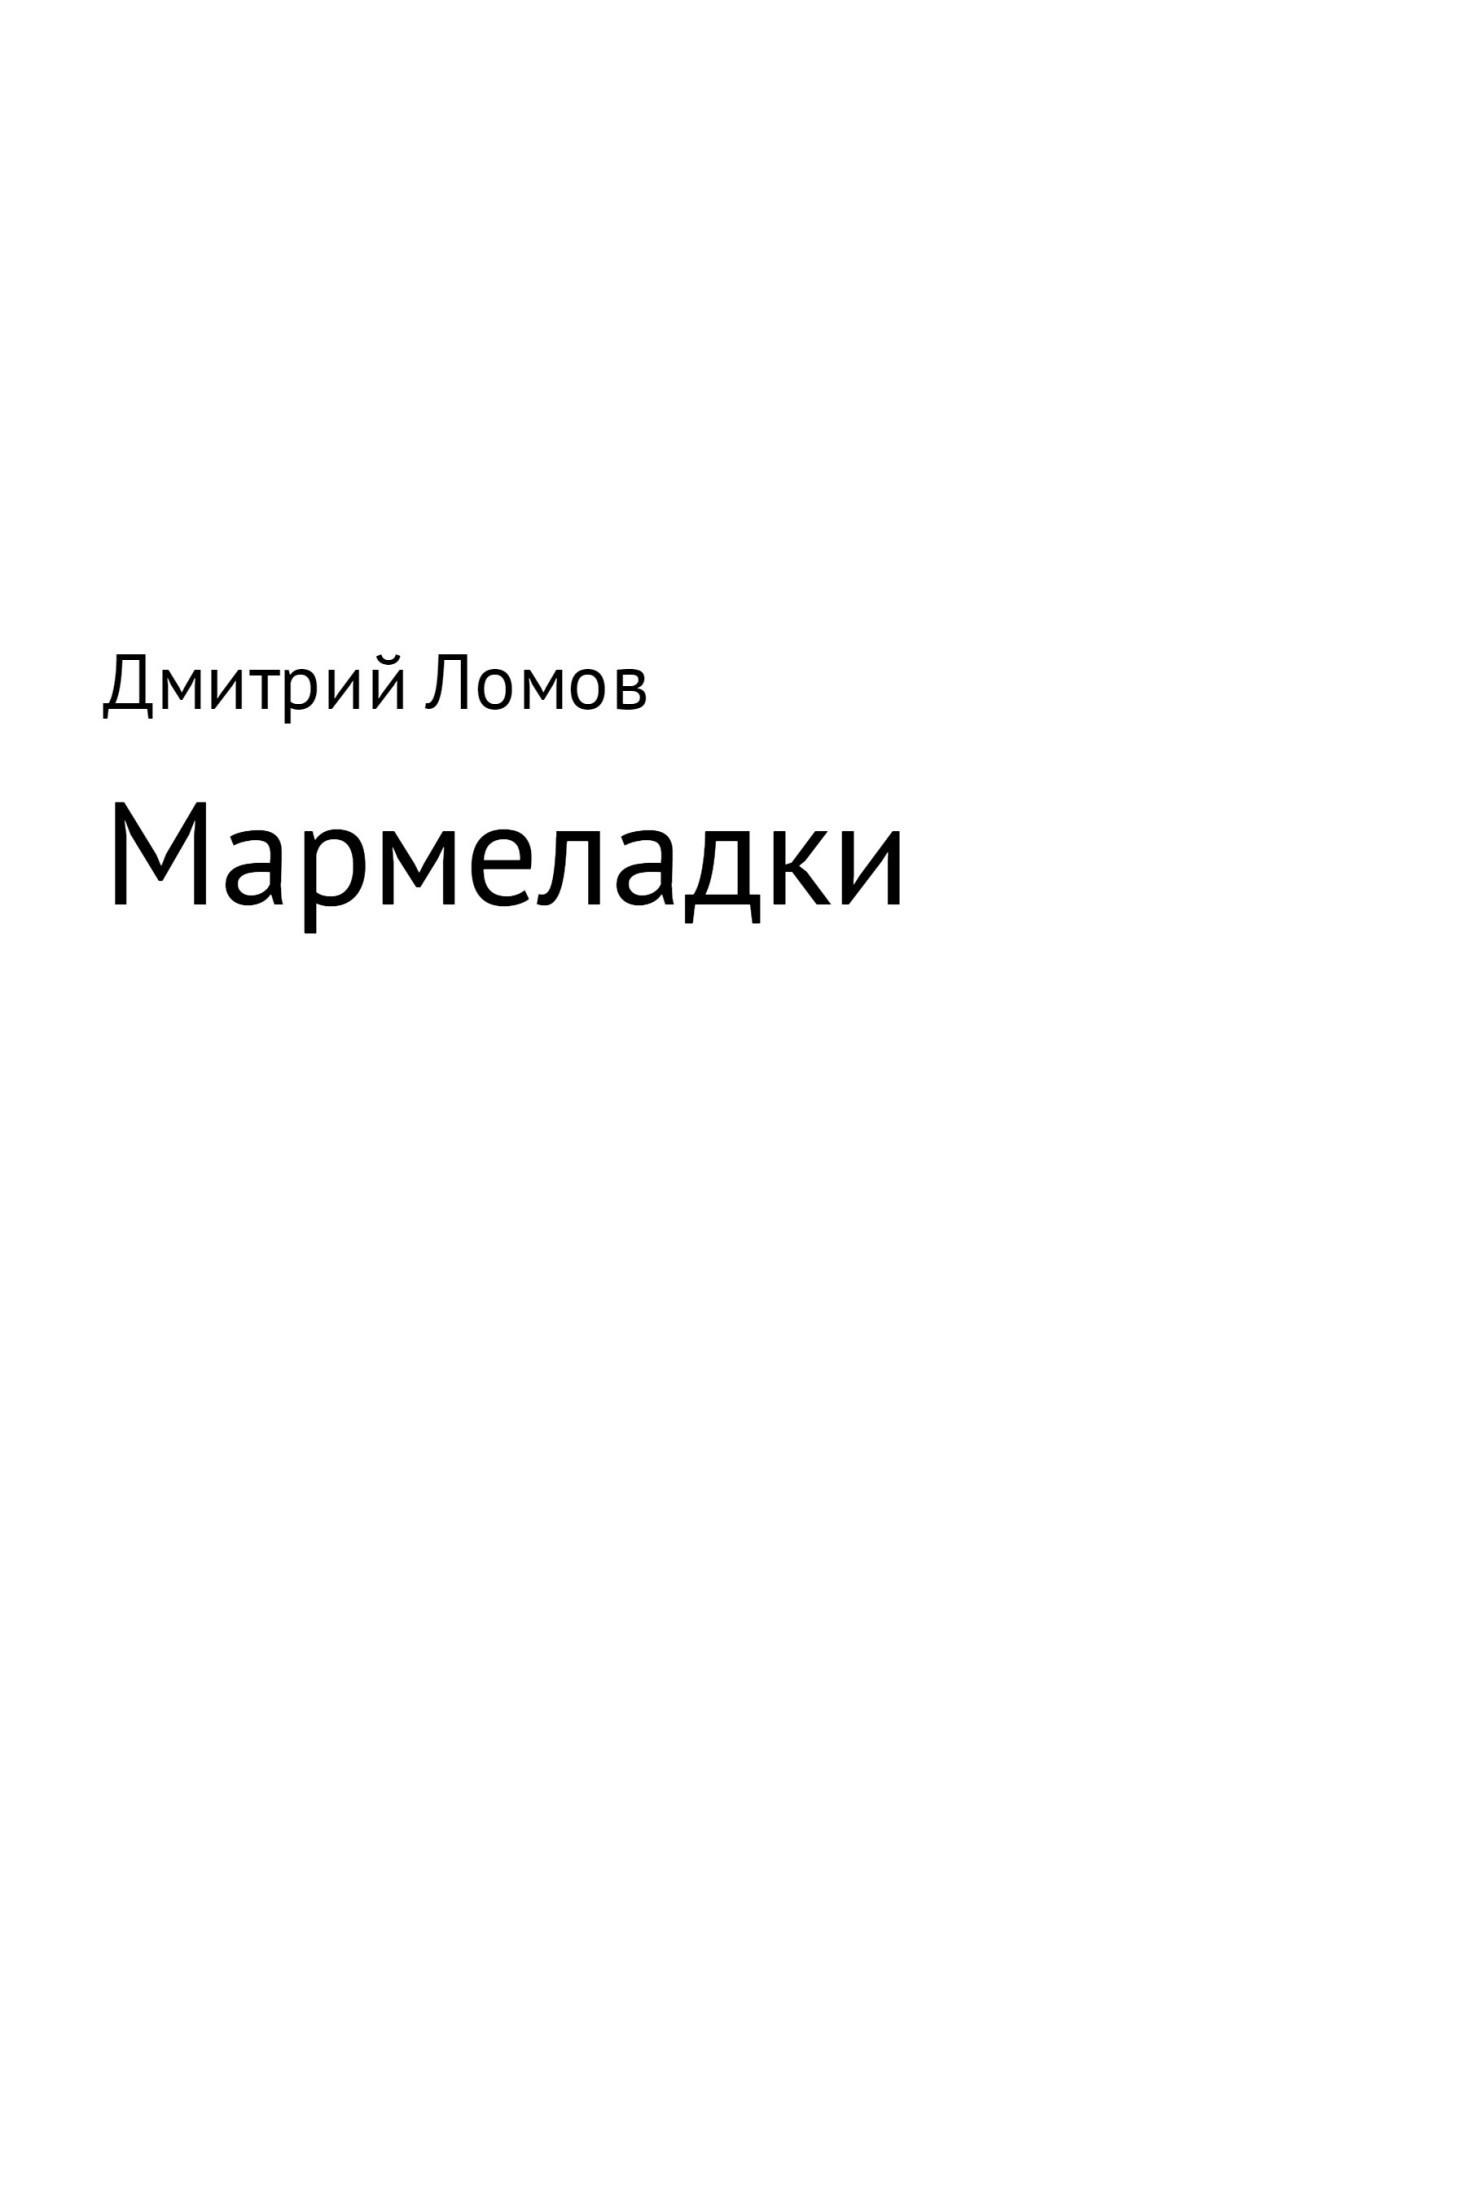 Дмитрий Ломов Мармеладки